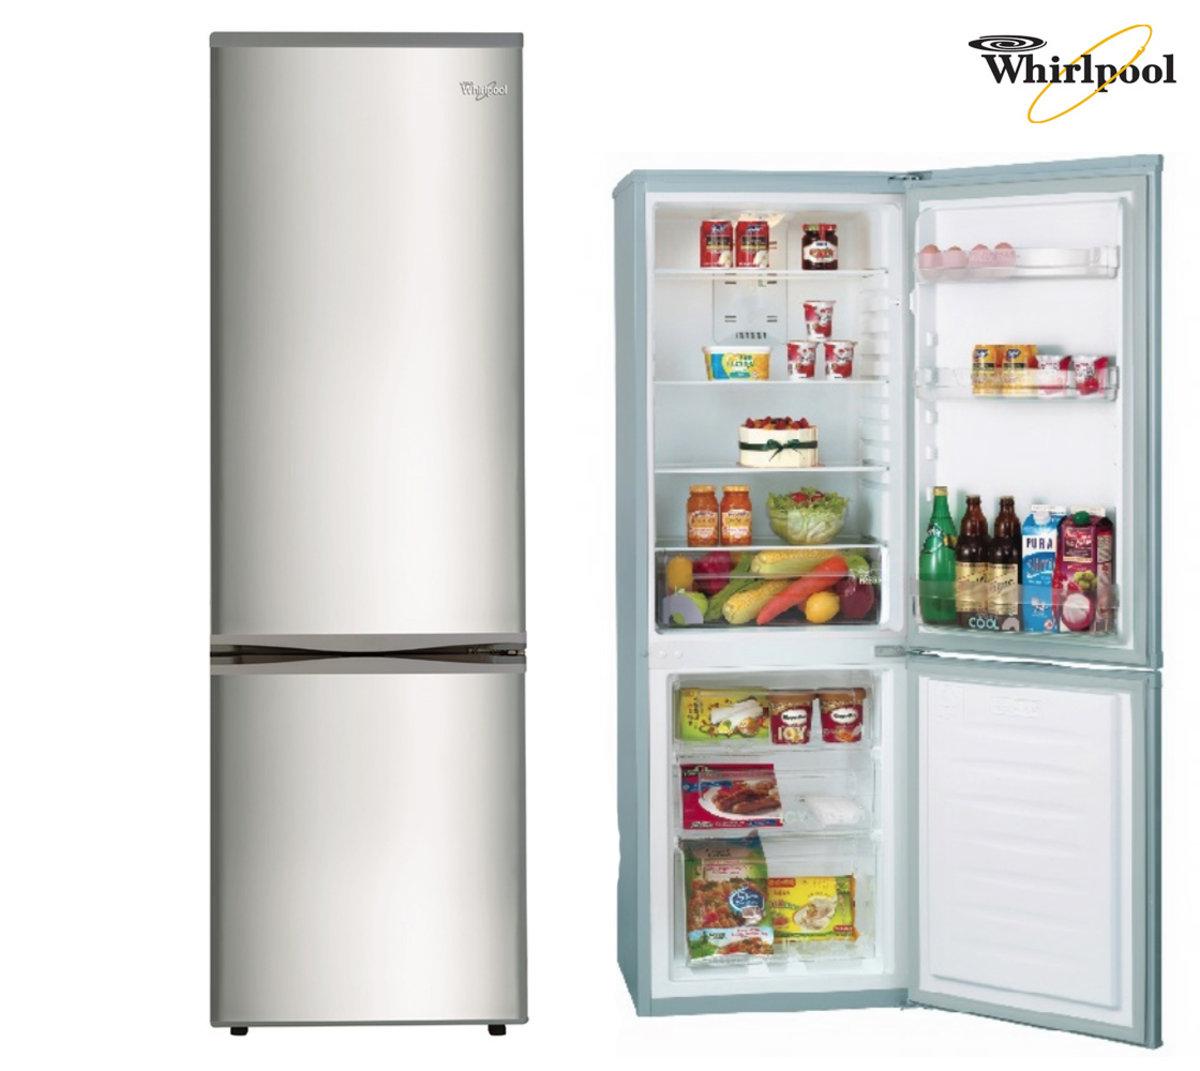 whirlpool 2 door refrigerator 224l bottom freezer wb251rix hktvmall online shopping. Black Bedroom Furniture Sets. Home Design Ideas